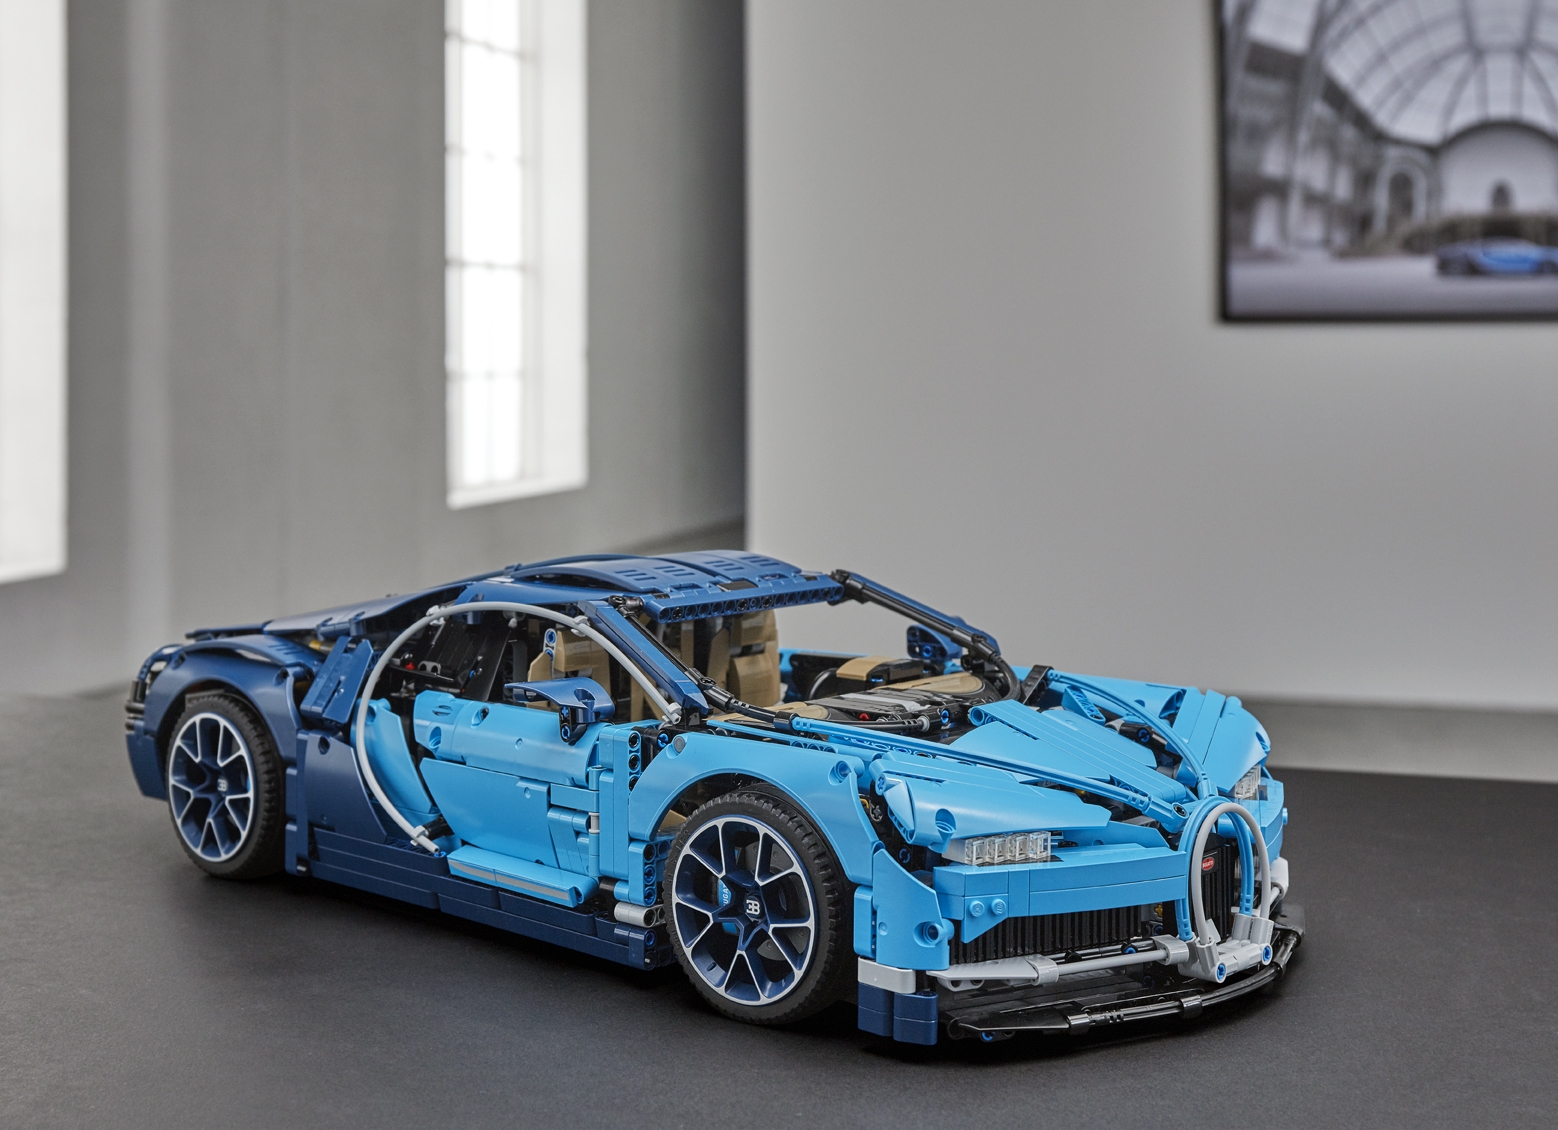 Lego and Bugatti – a match made in Denmark